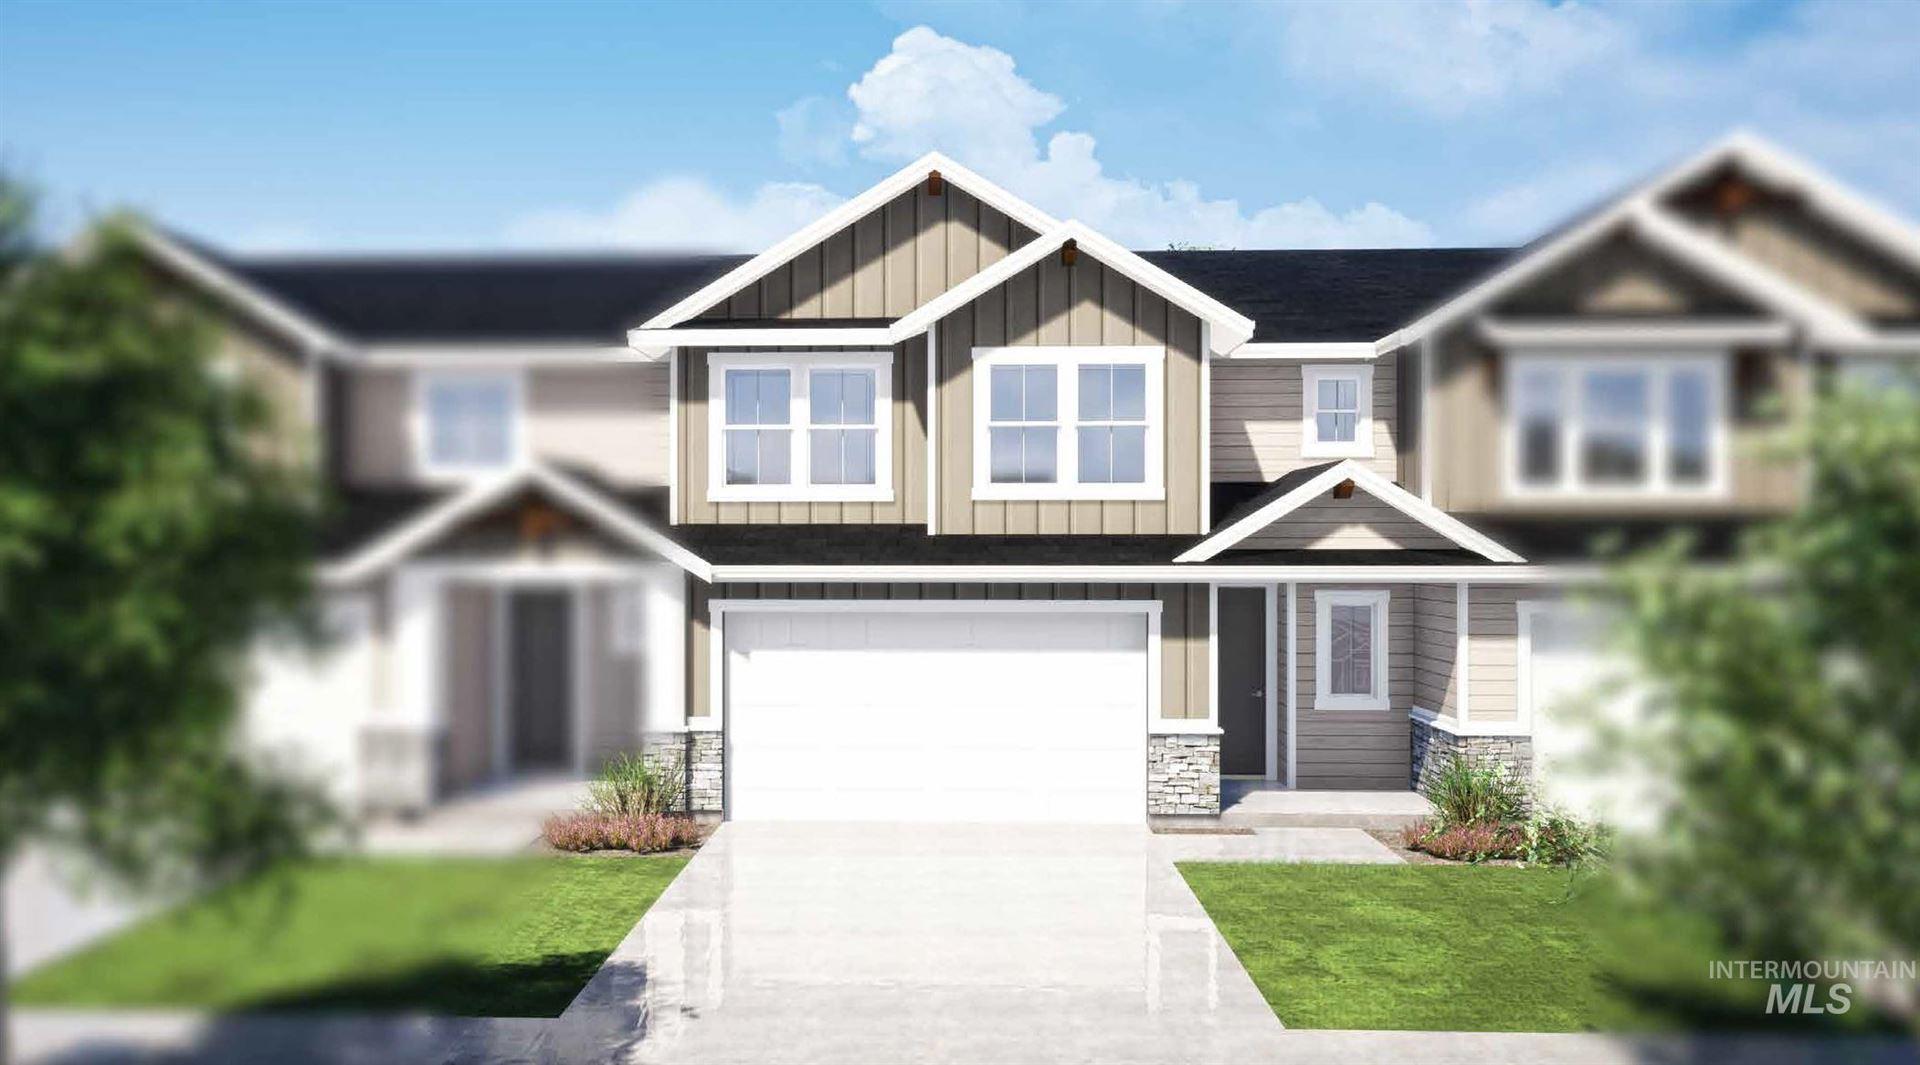 6369 S Gloriosa Ave., Boise, ID 83709 - MLS#: 98822895